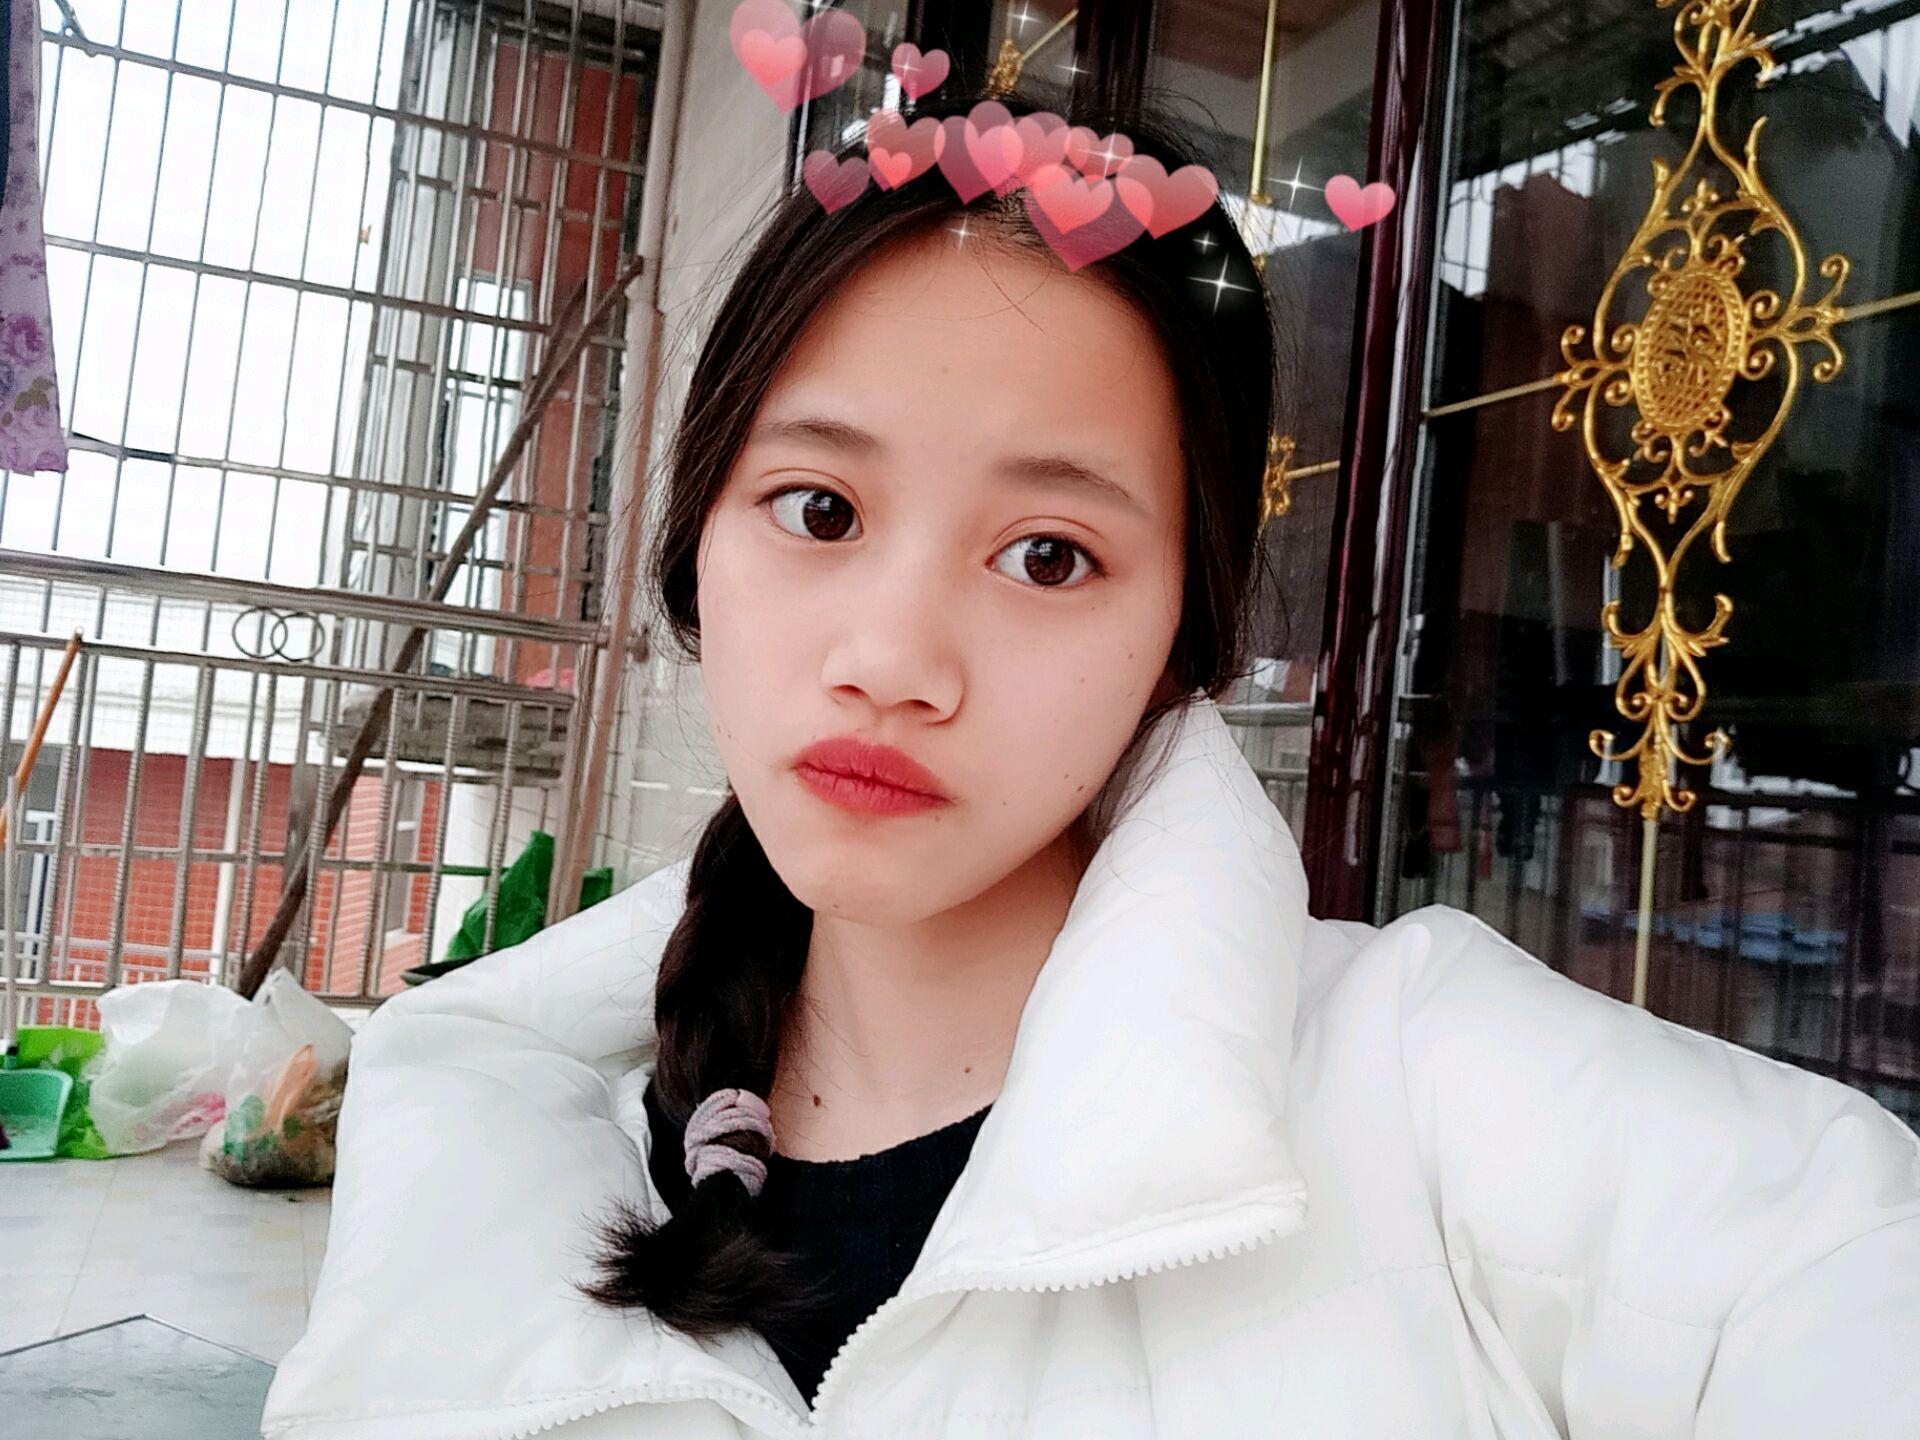 temp_WuTa_2018-02-09_12-58-37.jpg